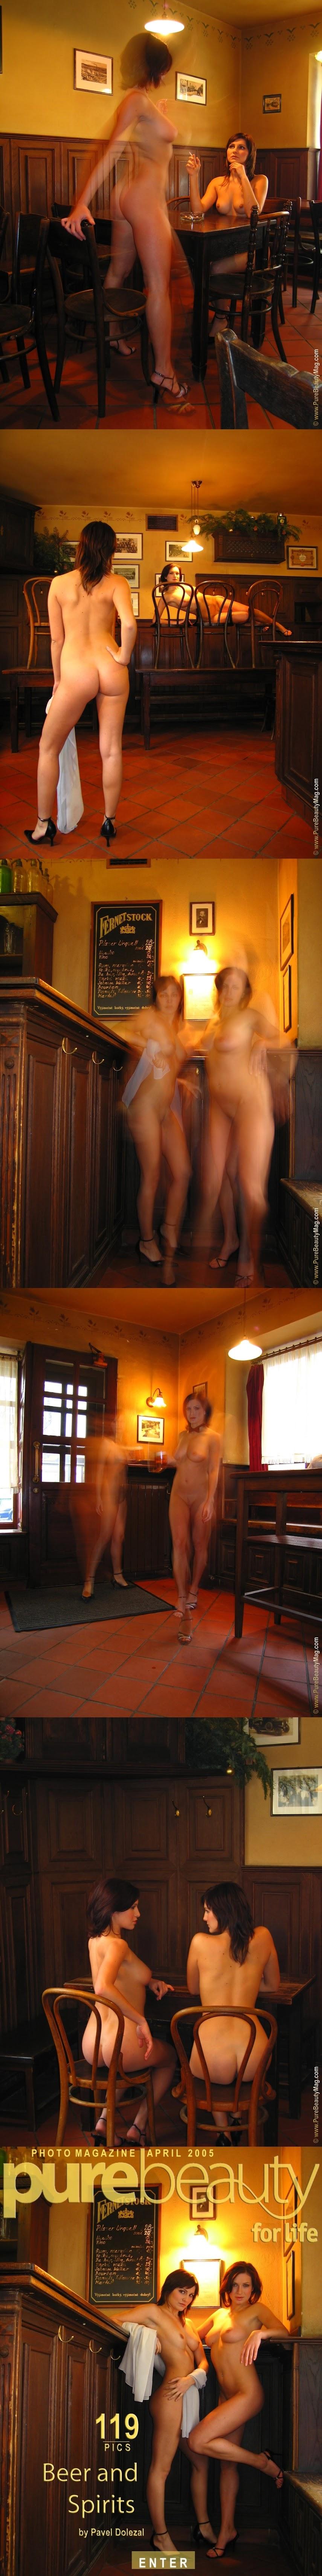 PureBeautyMag PBM  - 2005-04-18 -  s41223 - Alena  Simona - Beer and Spirits - 3072px